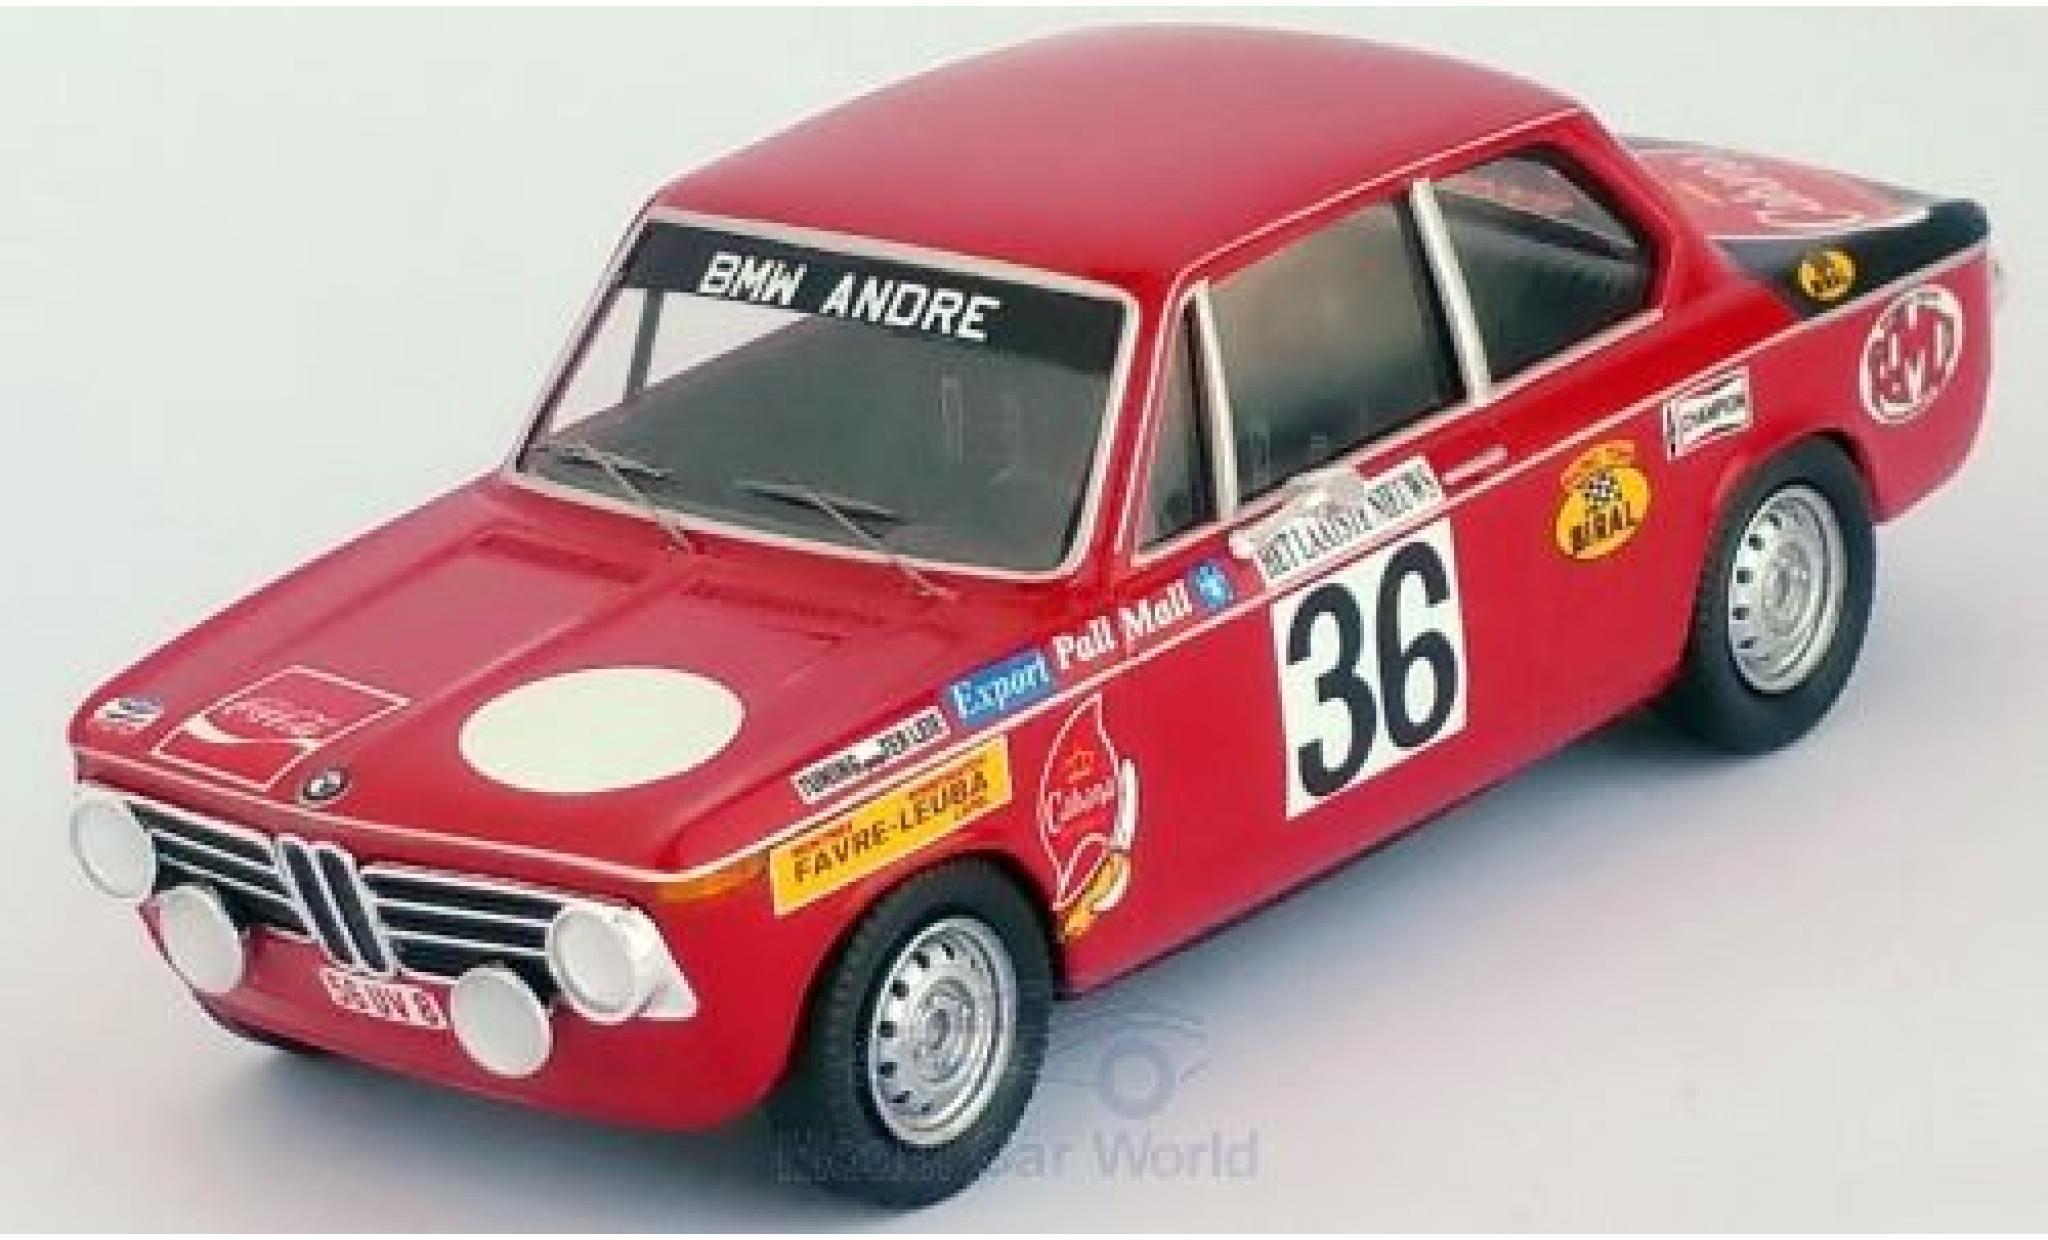 Bmw 2002 1/43 Trofeu ti No.36 Rally Ypres 1971 Pedro/Jimmy